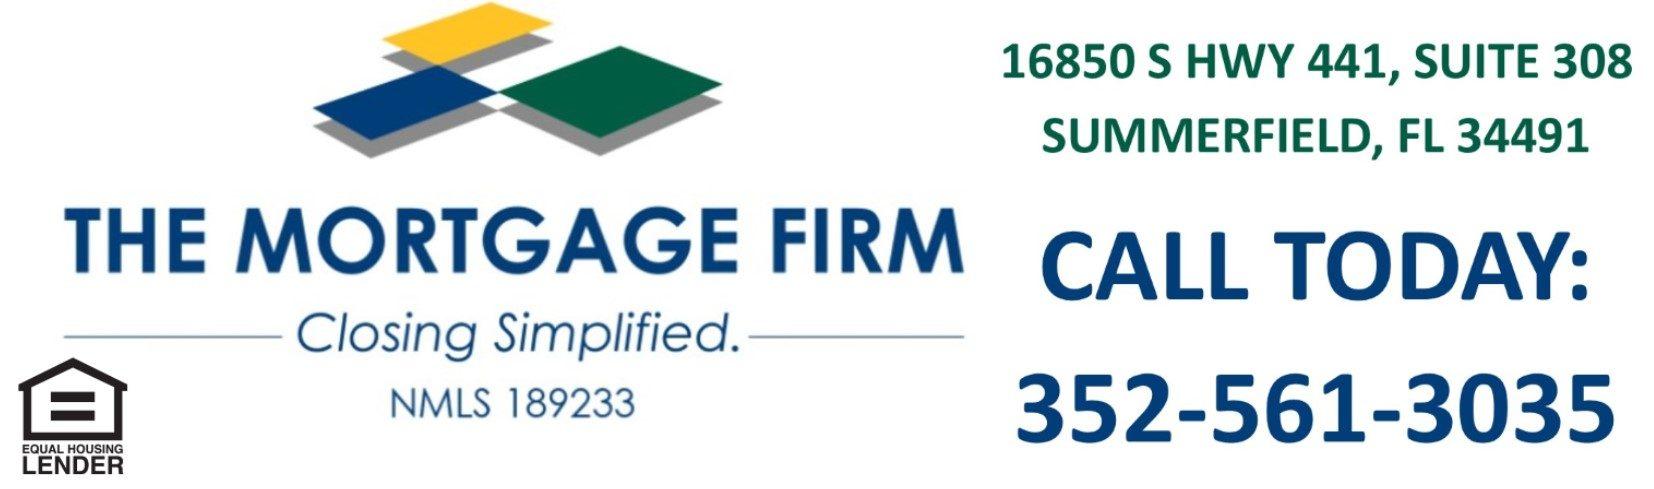 FinancingFlorida4U.com – The Mortgage Firm